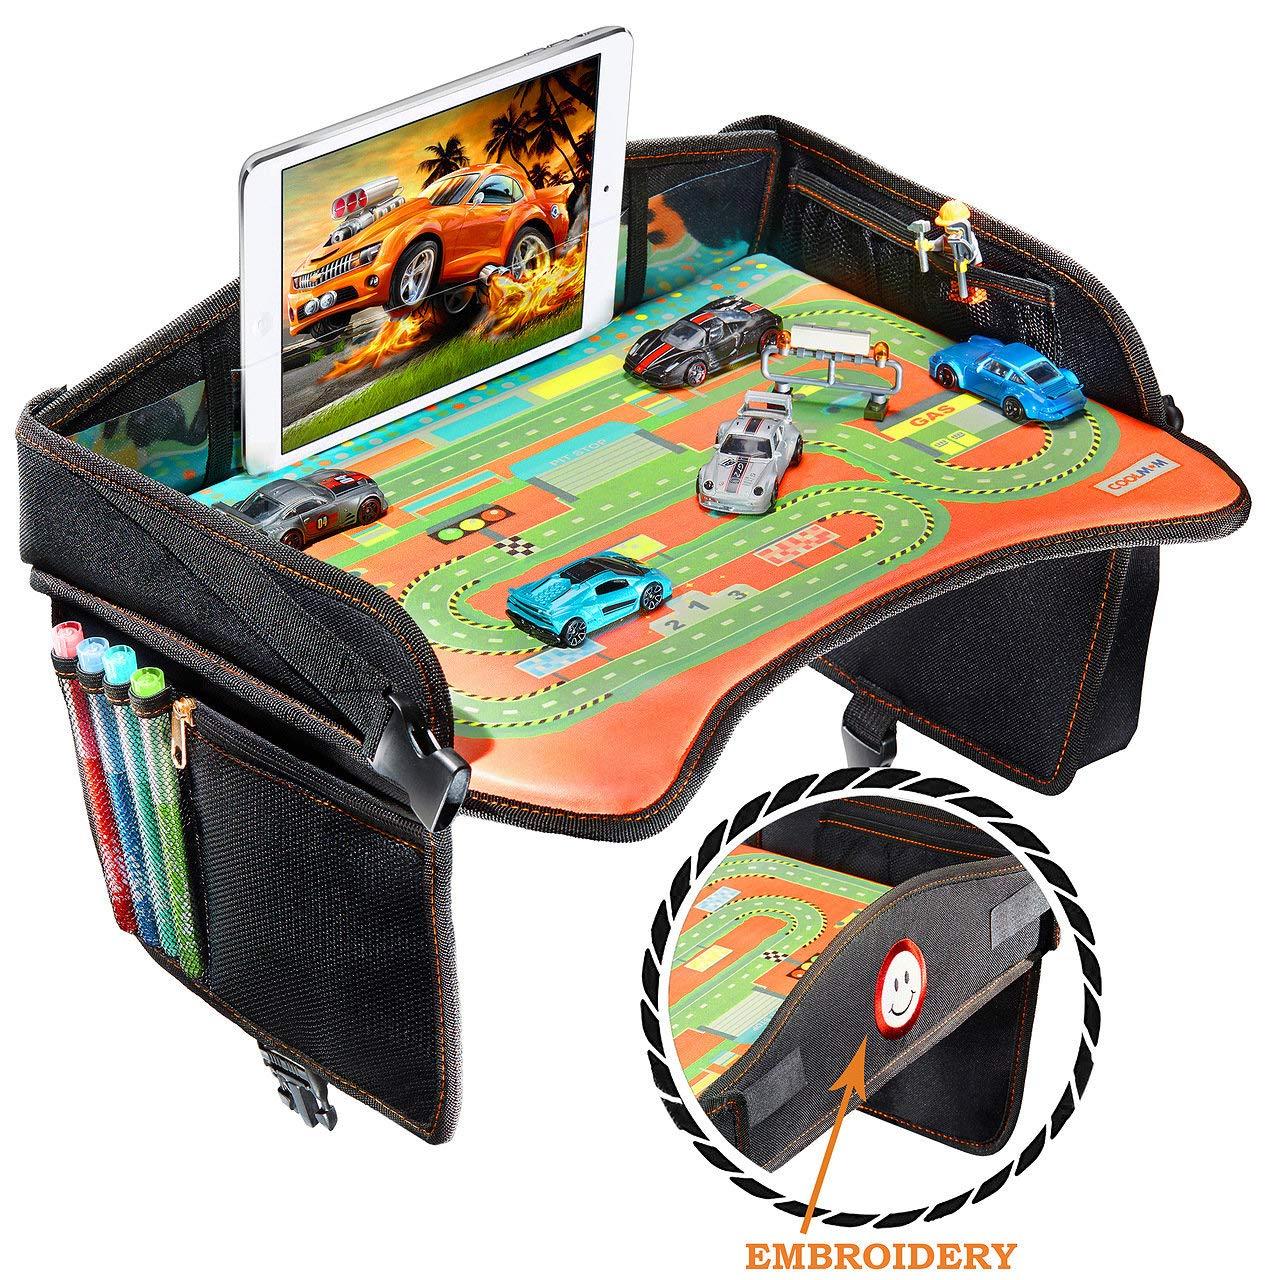 Smart Travel Tray – Ideal as Kids Travel Tray – Toddler Travel Tray & Baby Stroller Tray – Travel Activity Tray & Play Tray – Baby Snack Tray & Kid's Car Seat Tray - Play Table (Premium Black)